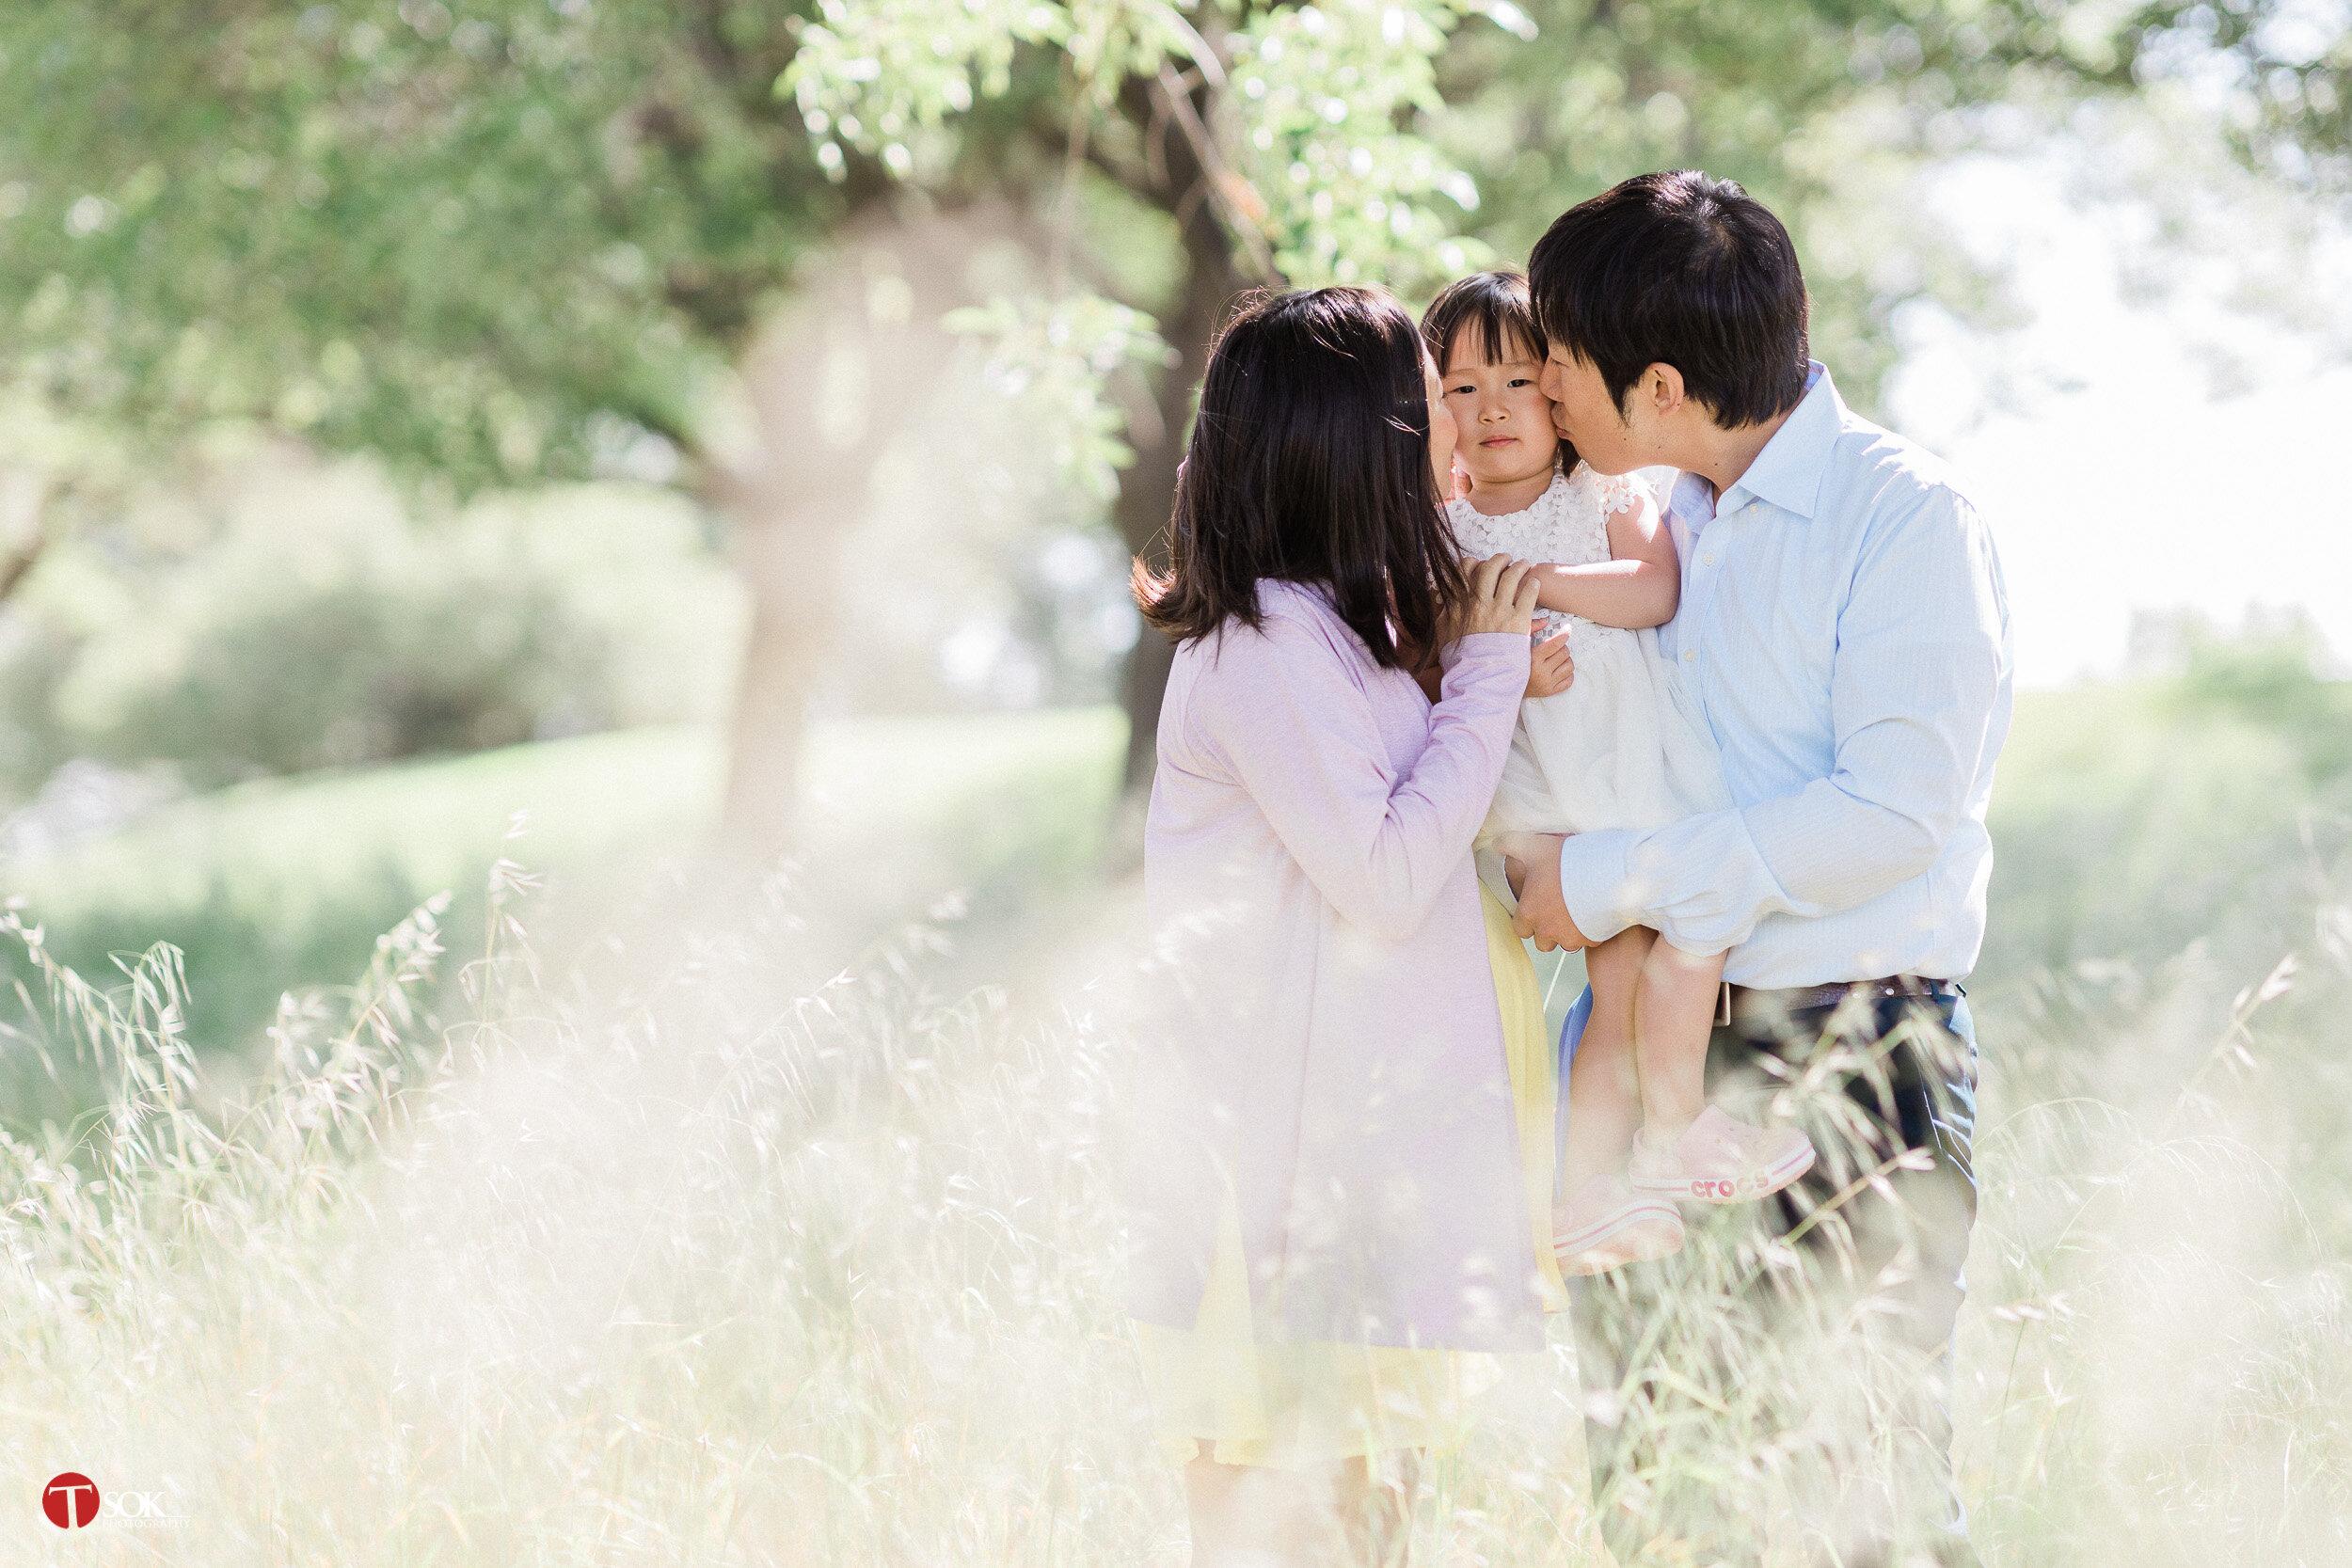 20190504_0001_yuen_maternity_baylands_park.jpg